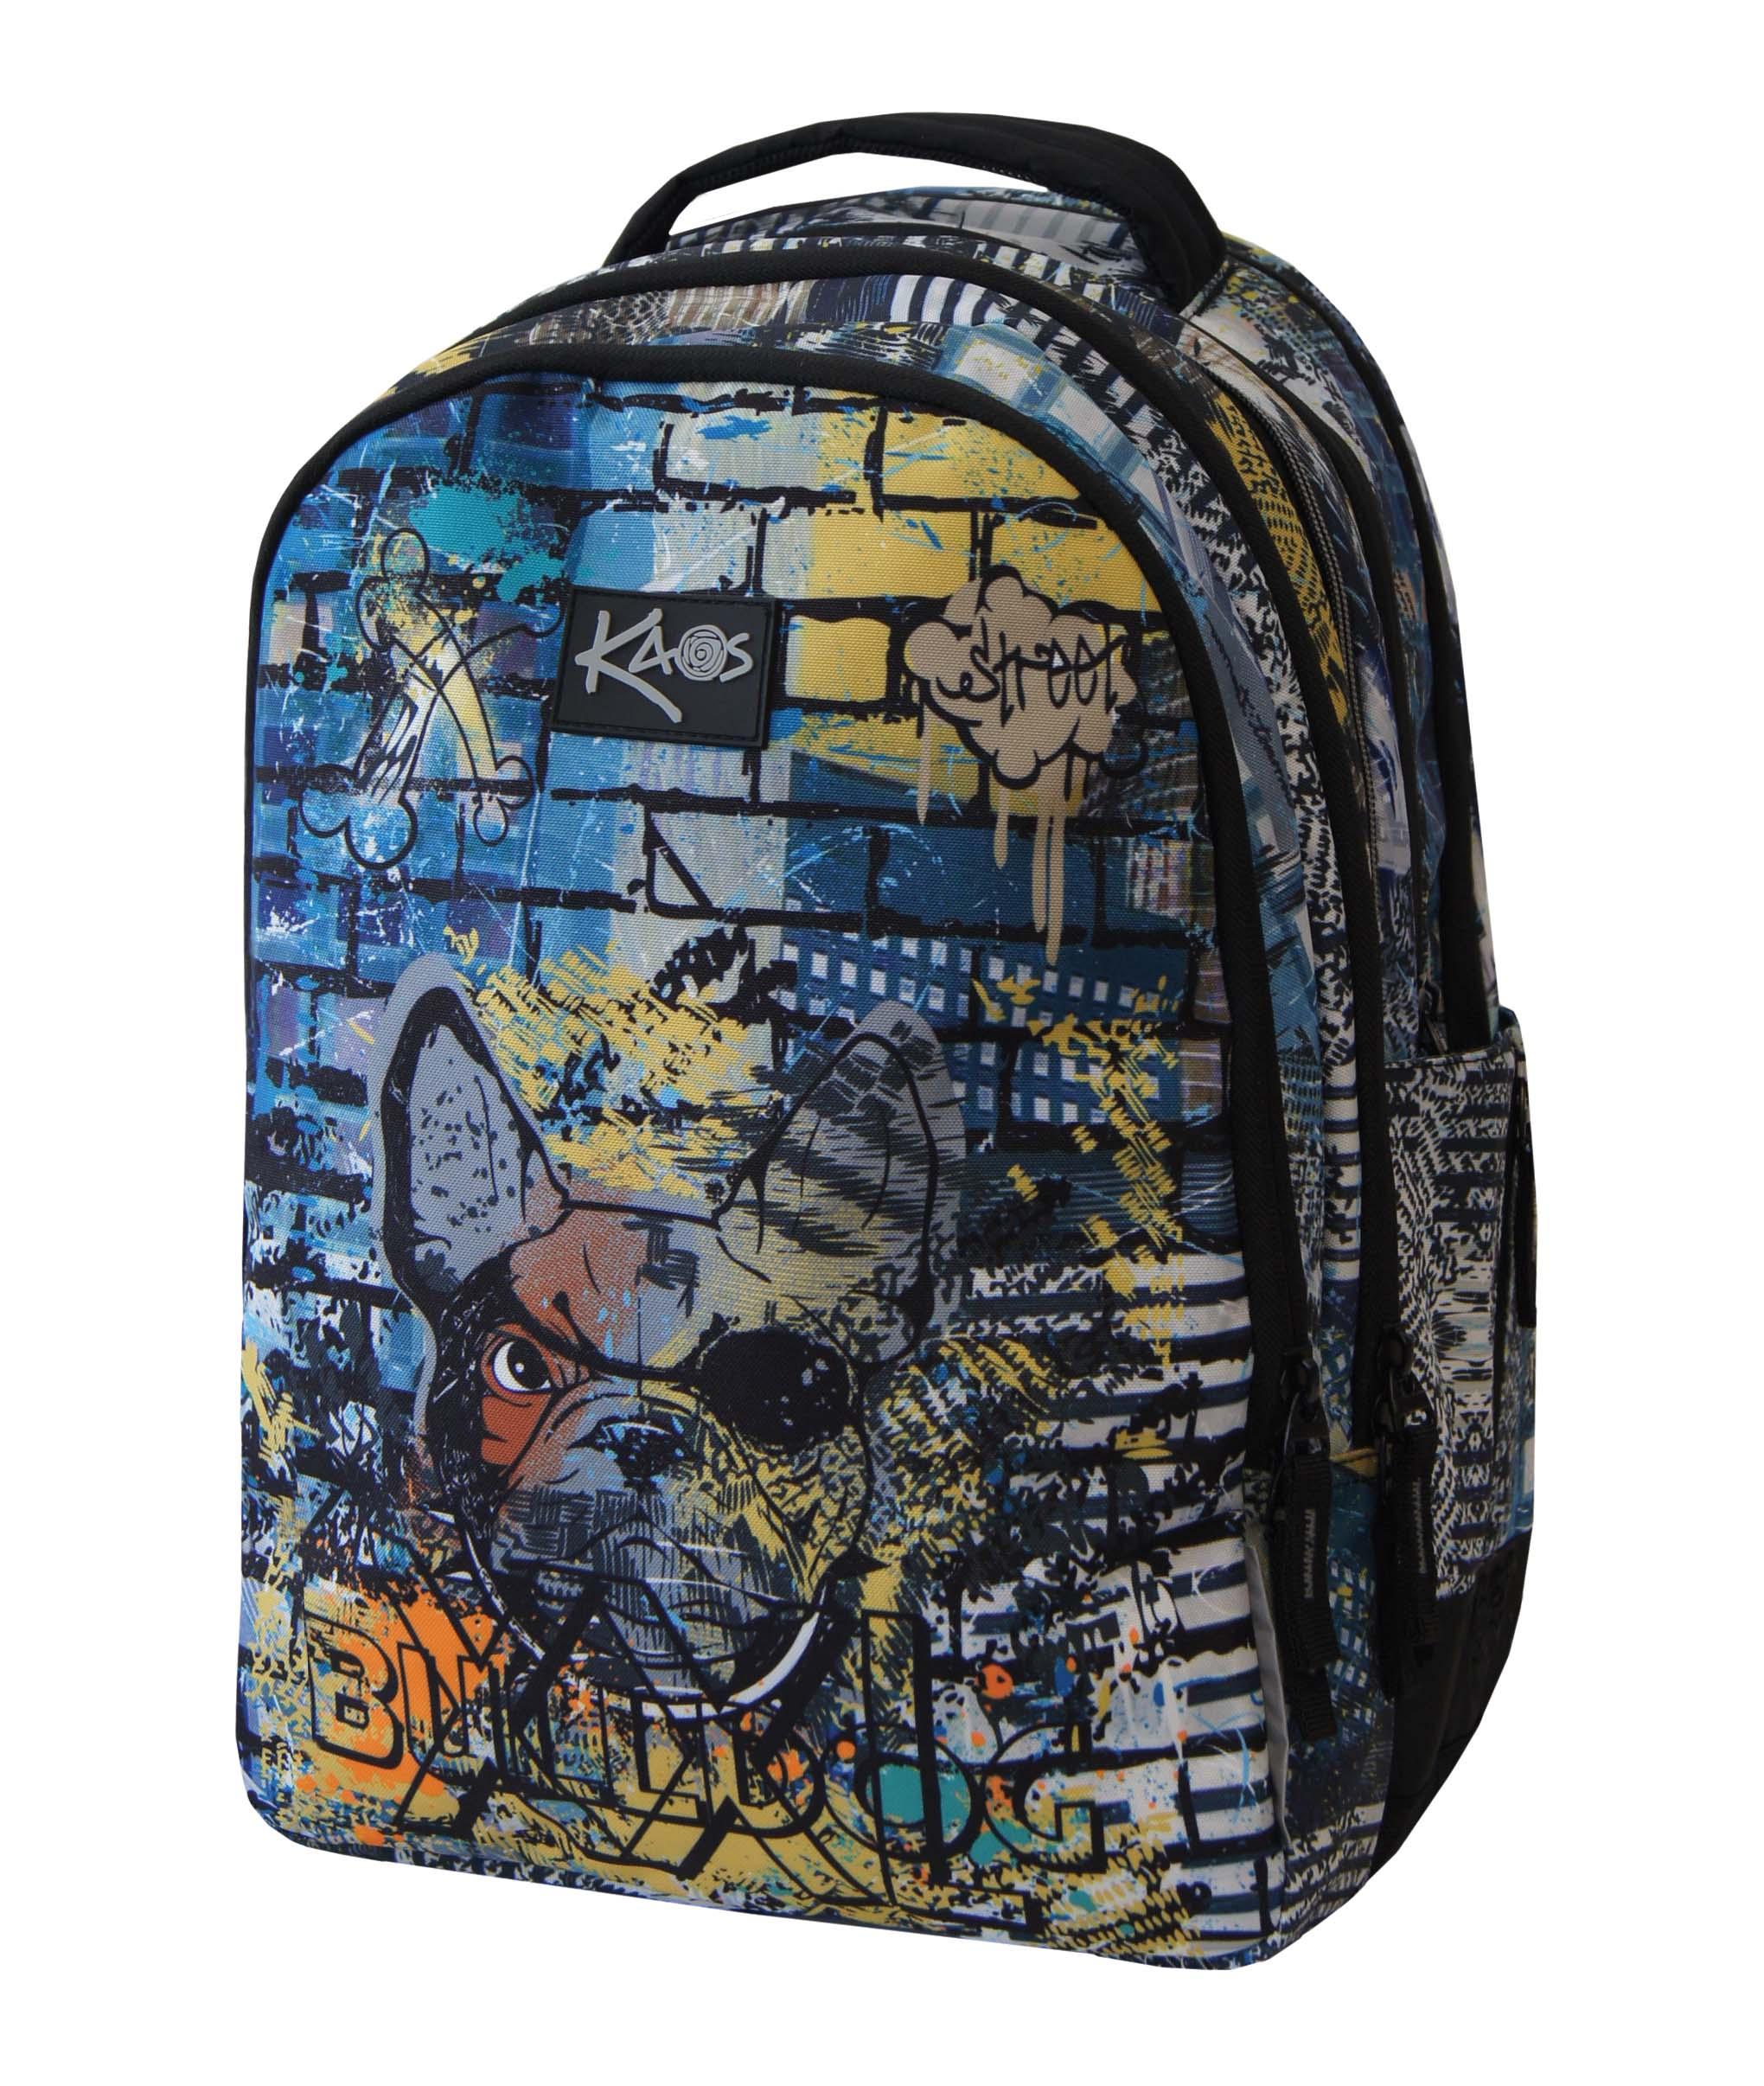 KAOS - Backpack 2-in-1 (36L) - Bulldog XXL (44867)